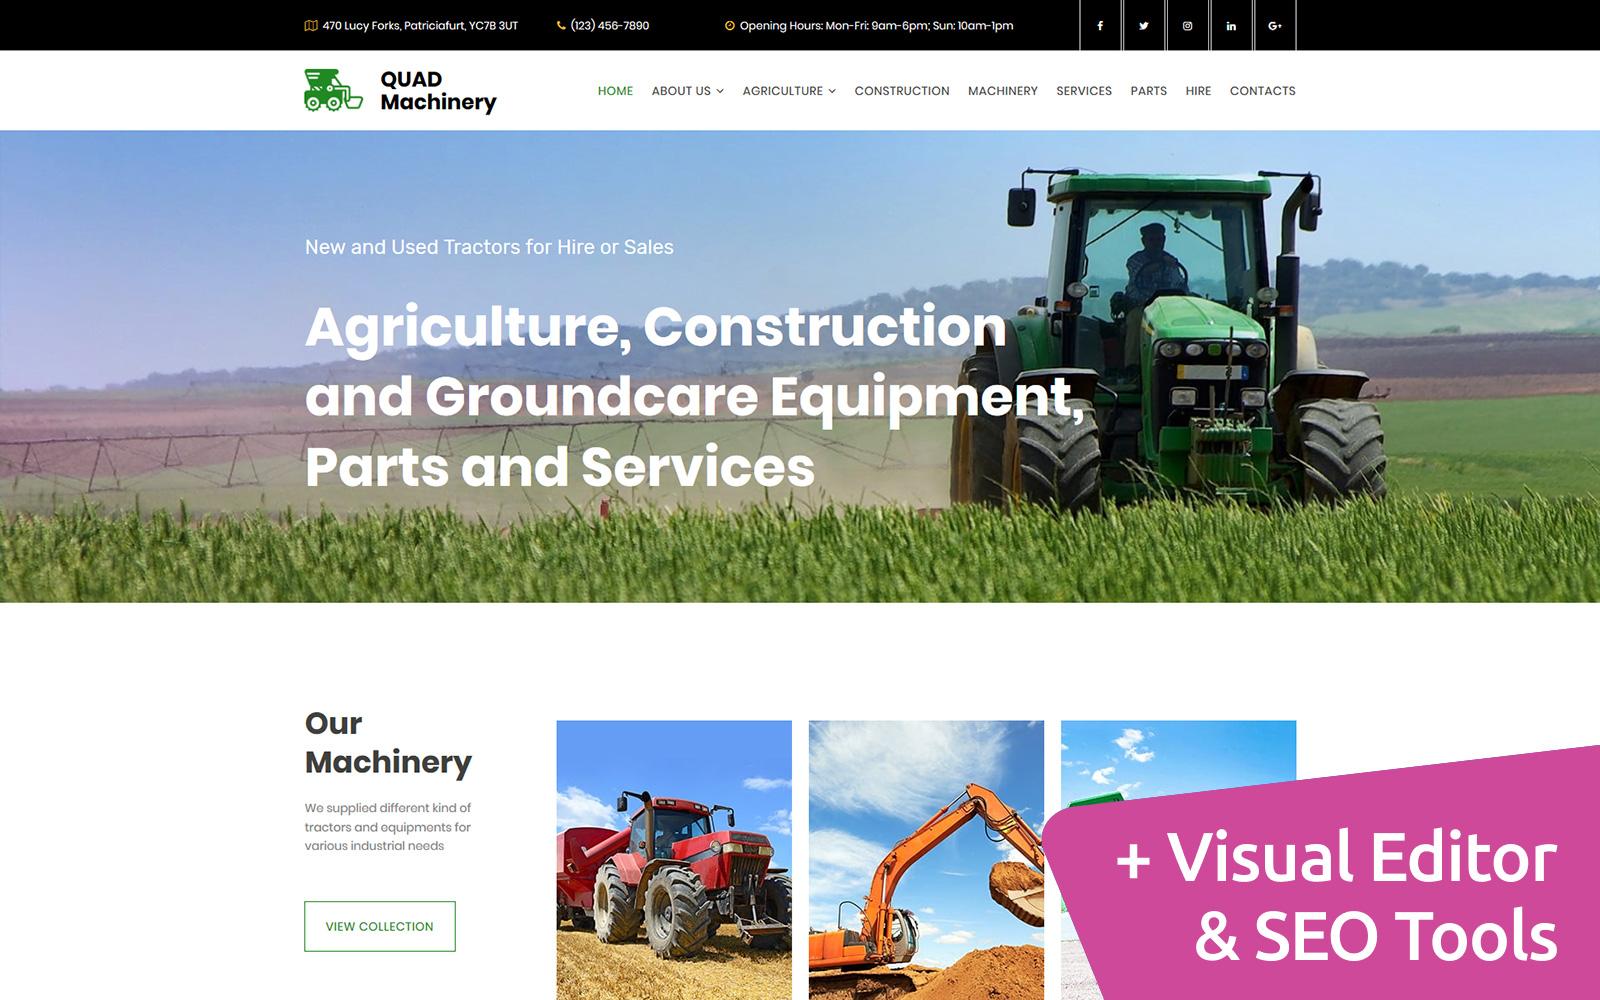 Tractor Machinery Premium Templates Moto CMS 3 №68198